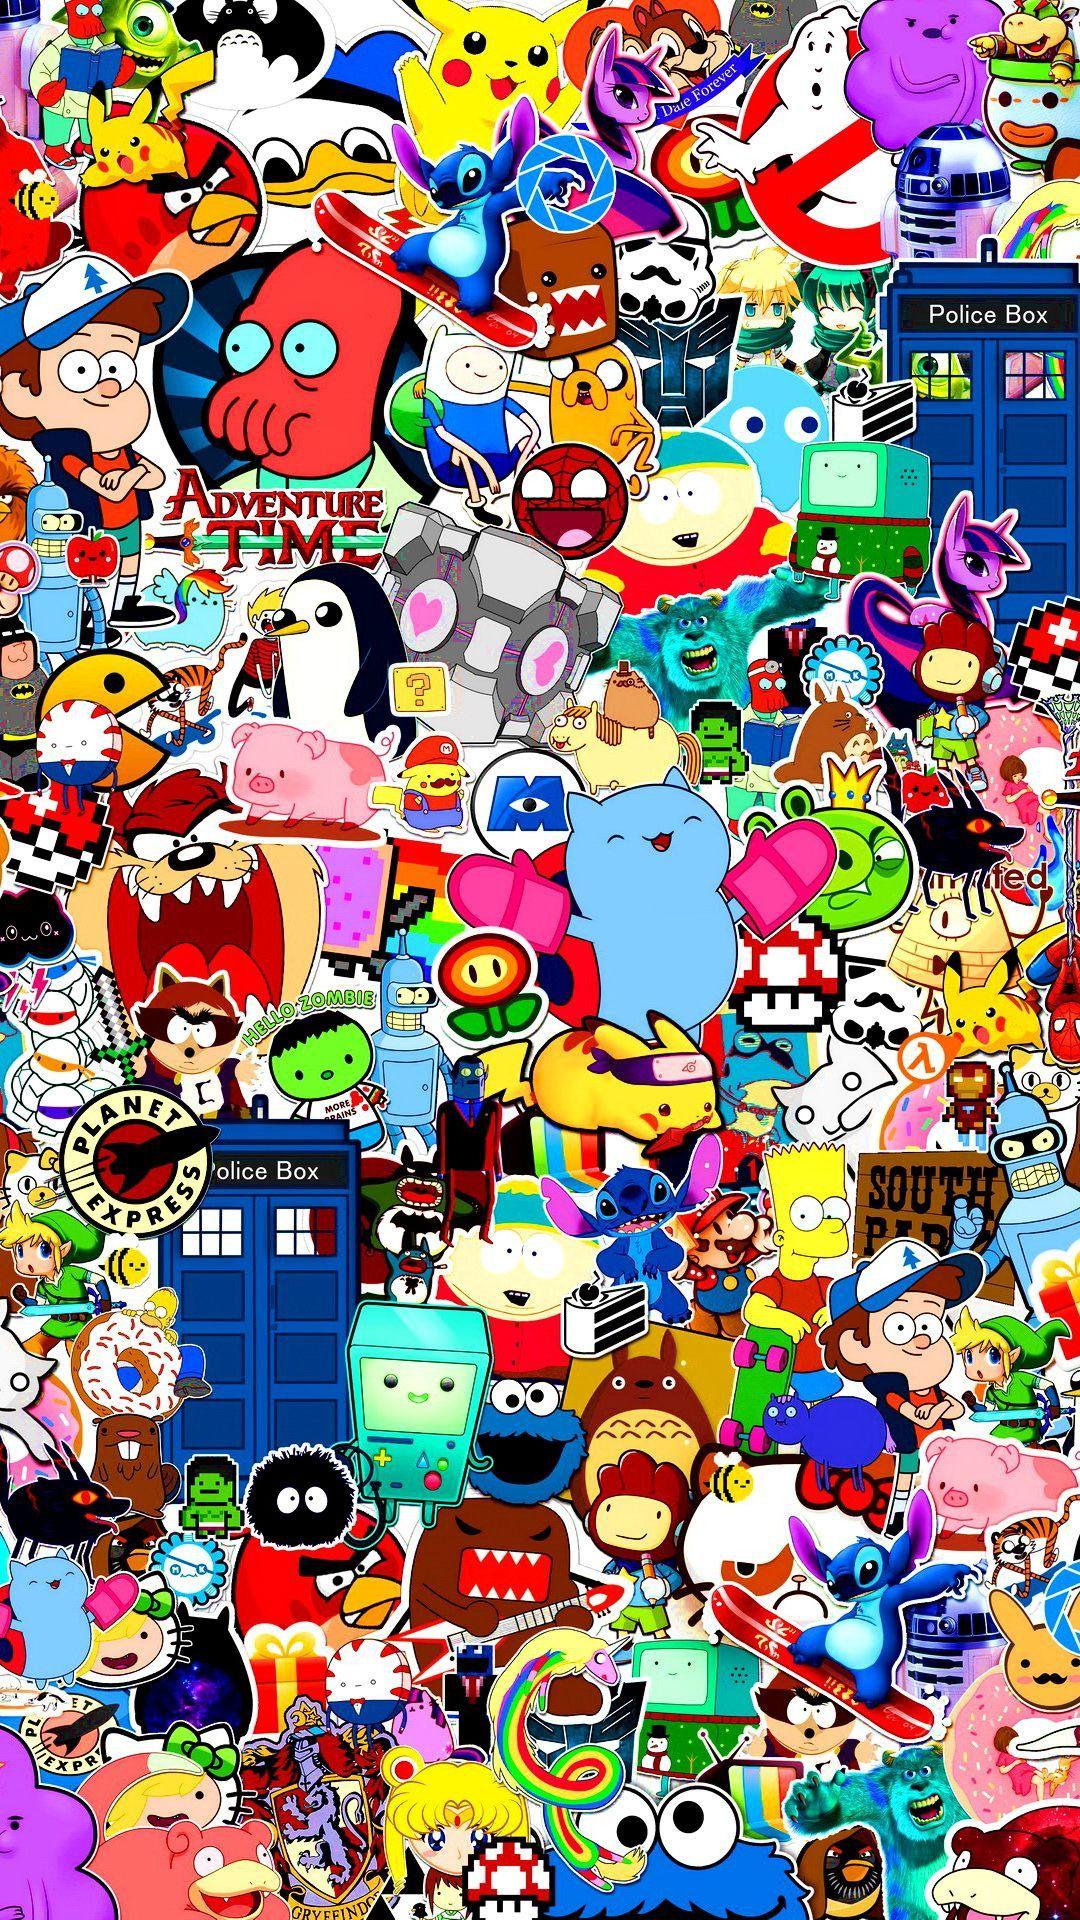 Best Of Fond D Ecran Swag Iphone Retina Wallpaper Art Wallpaper Hd Wallpaper Iphone